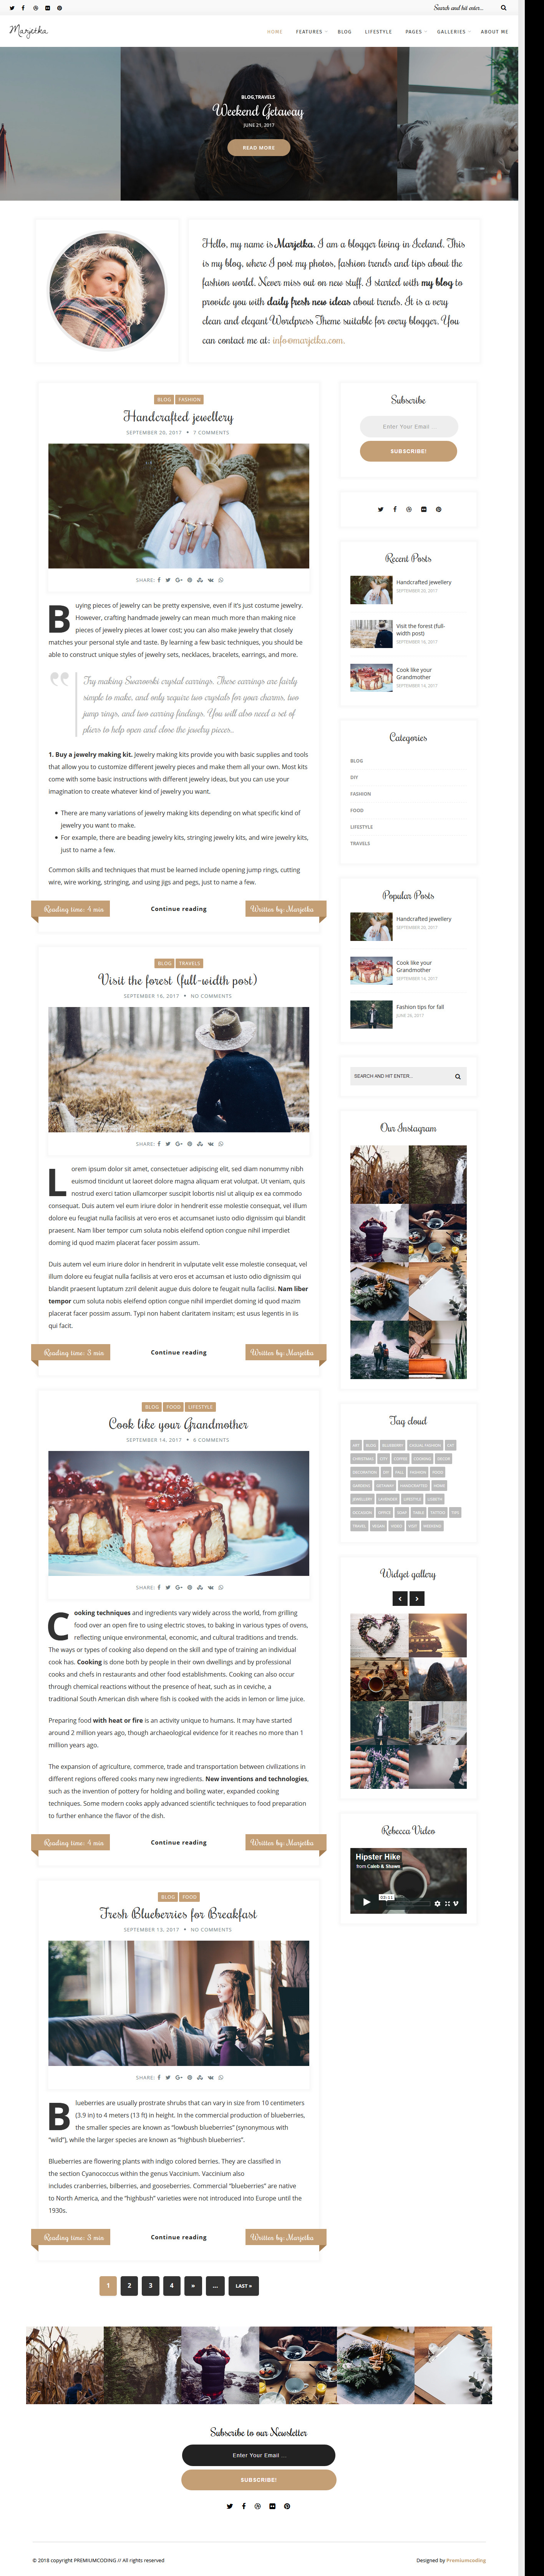 marjetka best premium feminine wordpress theme 1 - 10+ Best Feminine WordPress Themes (Premium Version)